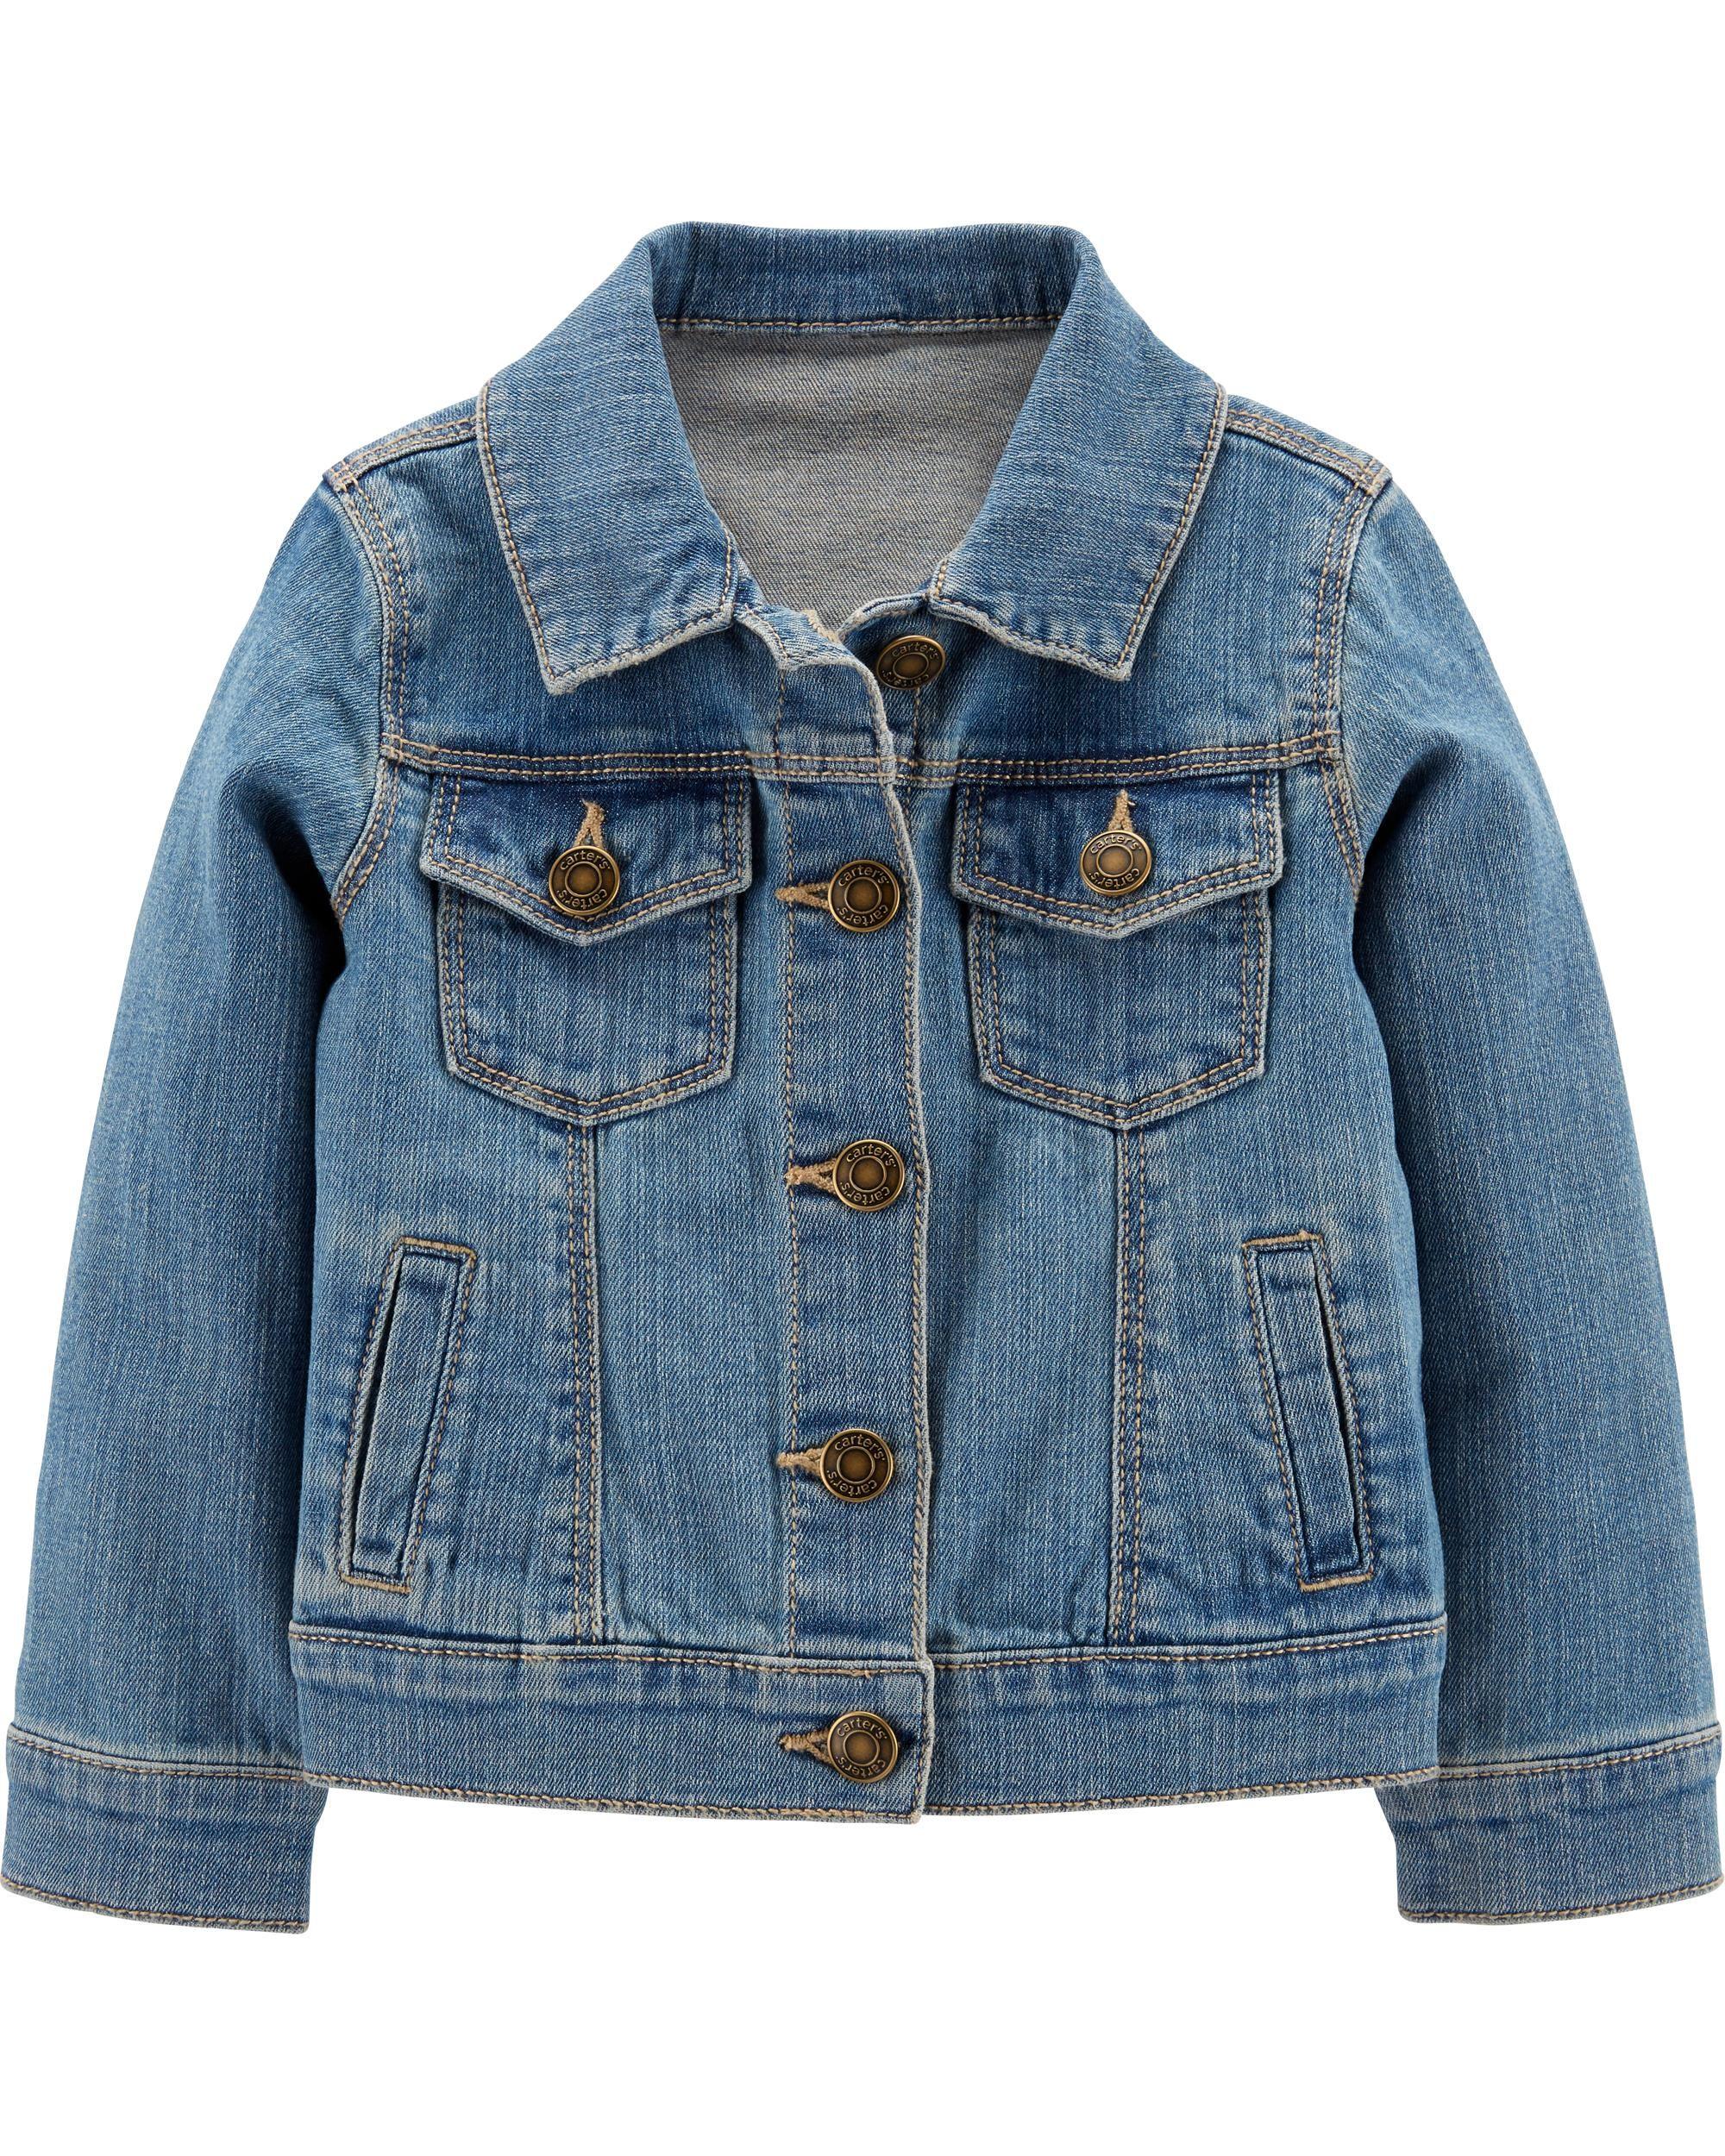 Denim Jacket Girls Denim Jacket Denim Jacket Girls Denim [ 2500 x 2000 Pixel ]